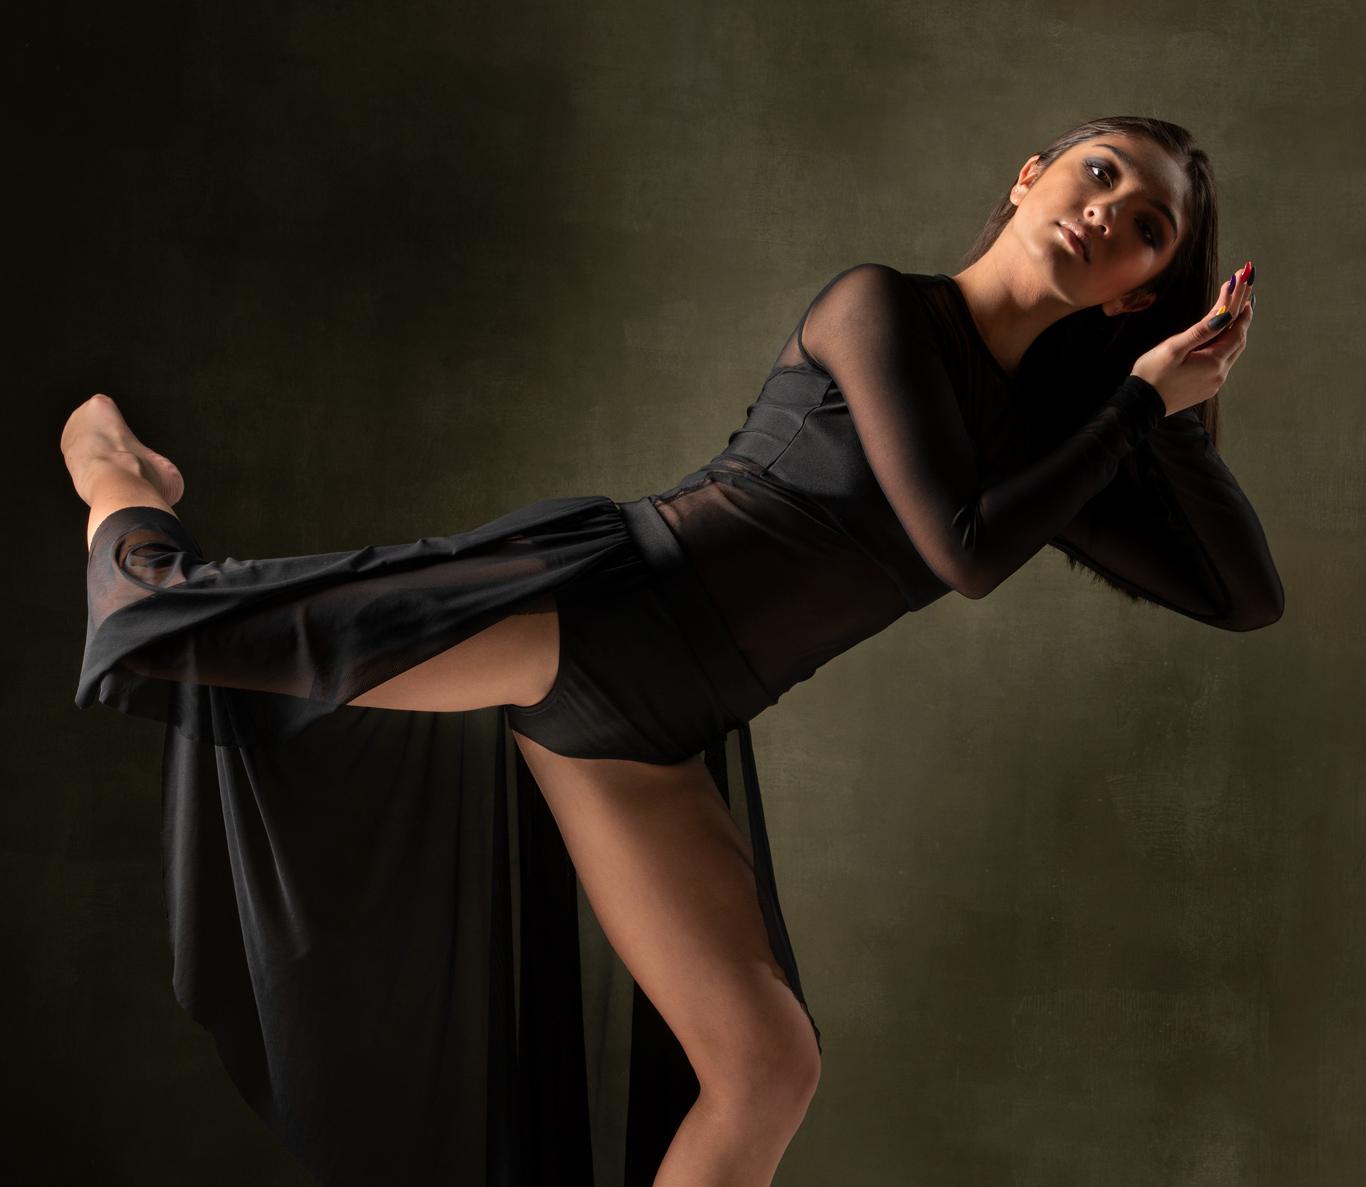 fashion photography of a dancer